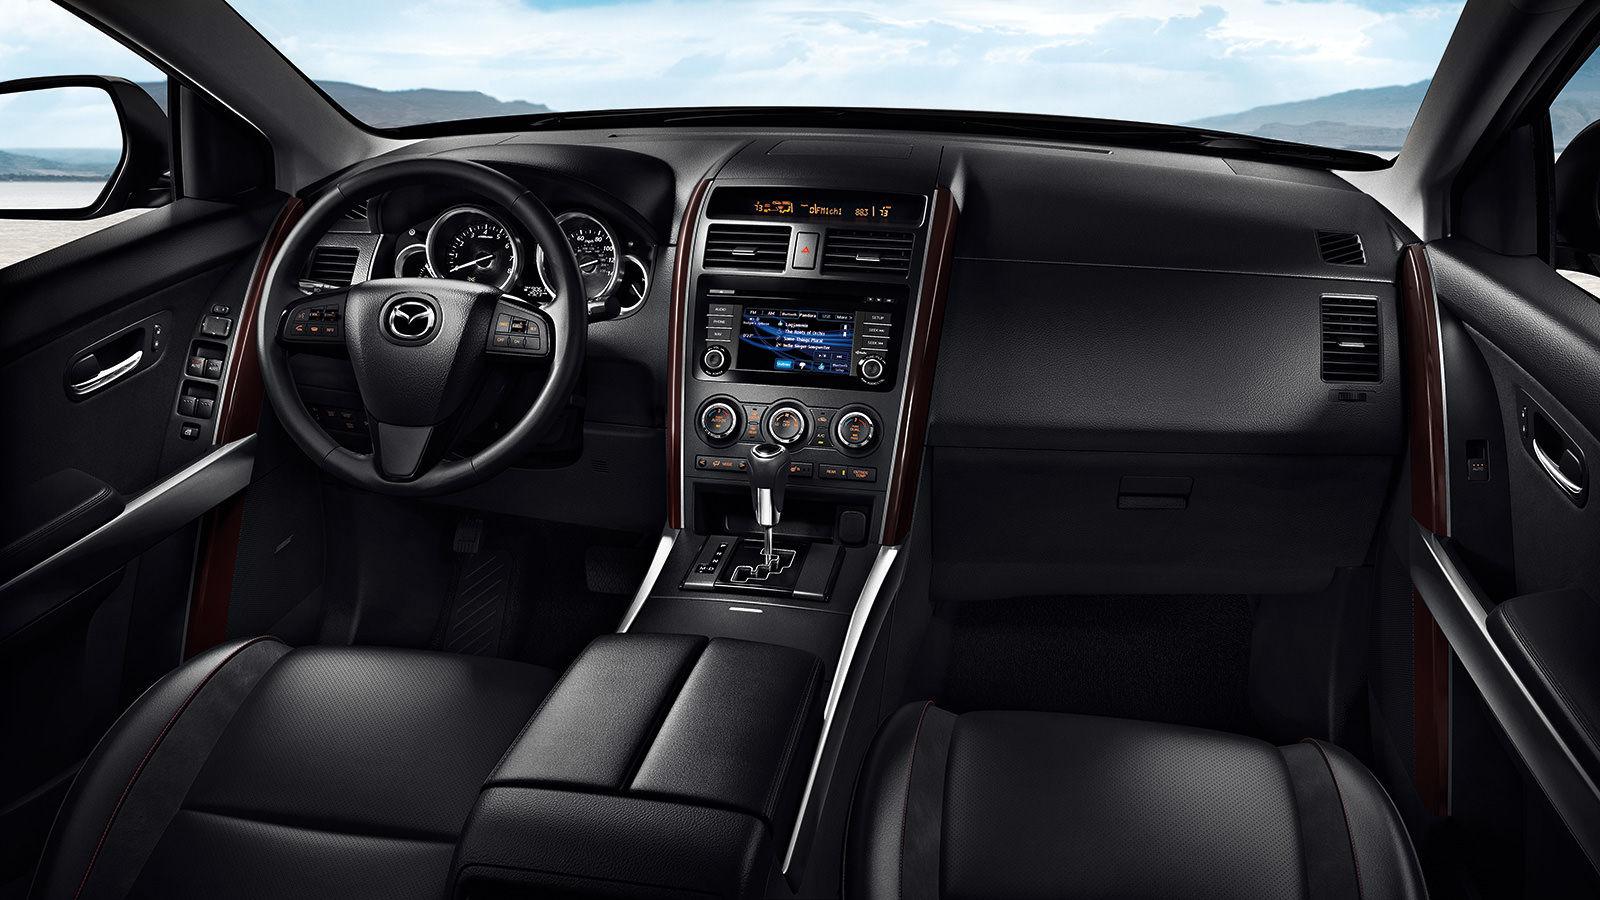 Kramer Mazda | 2015 Mazda CX-9 – Comfortable, spacious, and fun to drive Picture 4